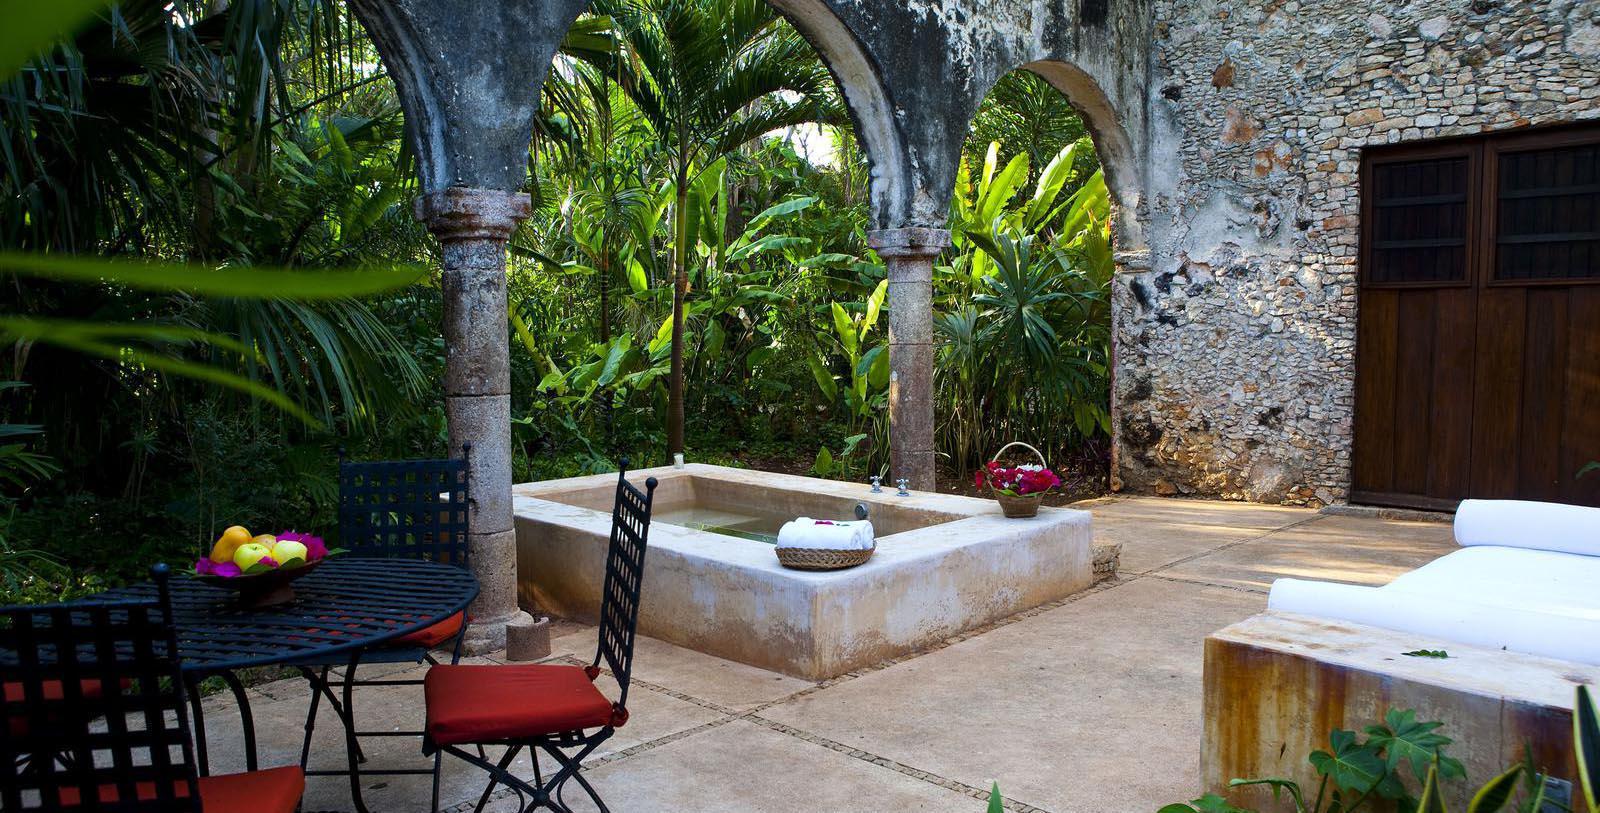 Image of Villa Pool, Hacienda Santa Rosa, A Luxury Collection Hotel, Santa Rosa, Mexico, 1897, Member of Historic Hotels Worldwide, Hot Deals